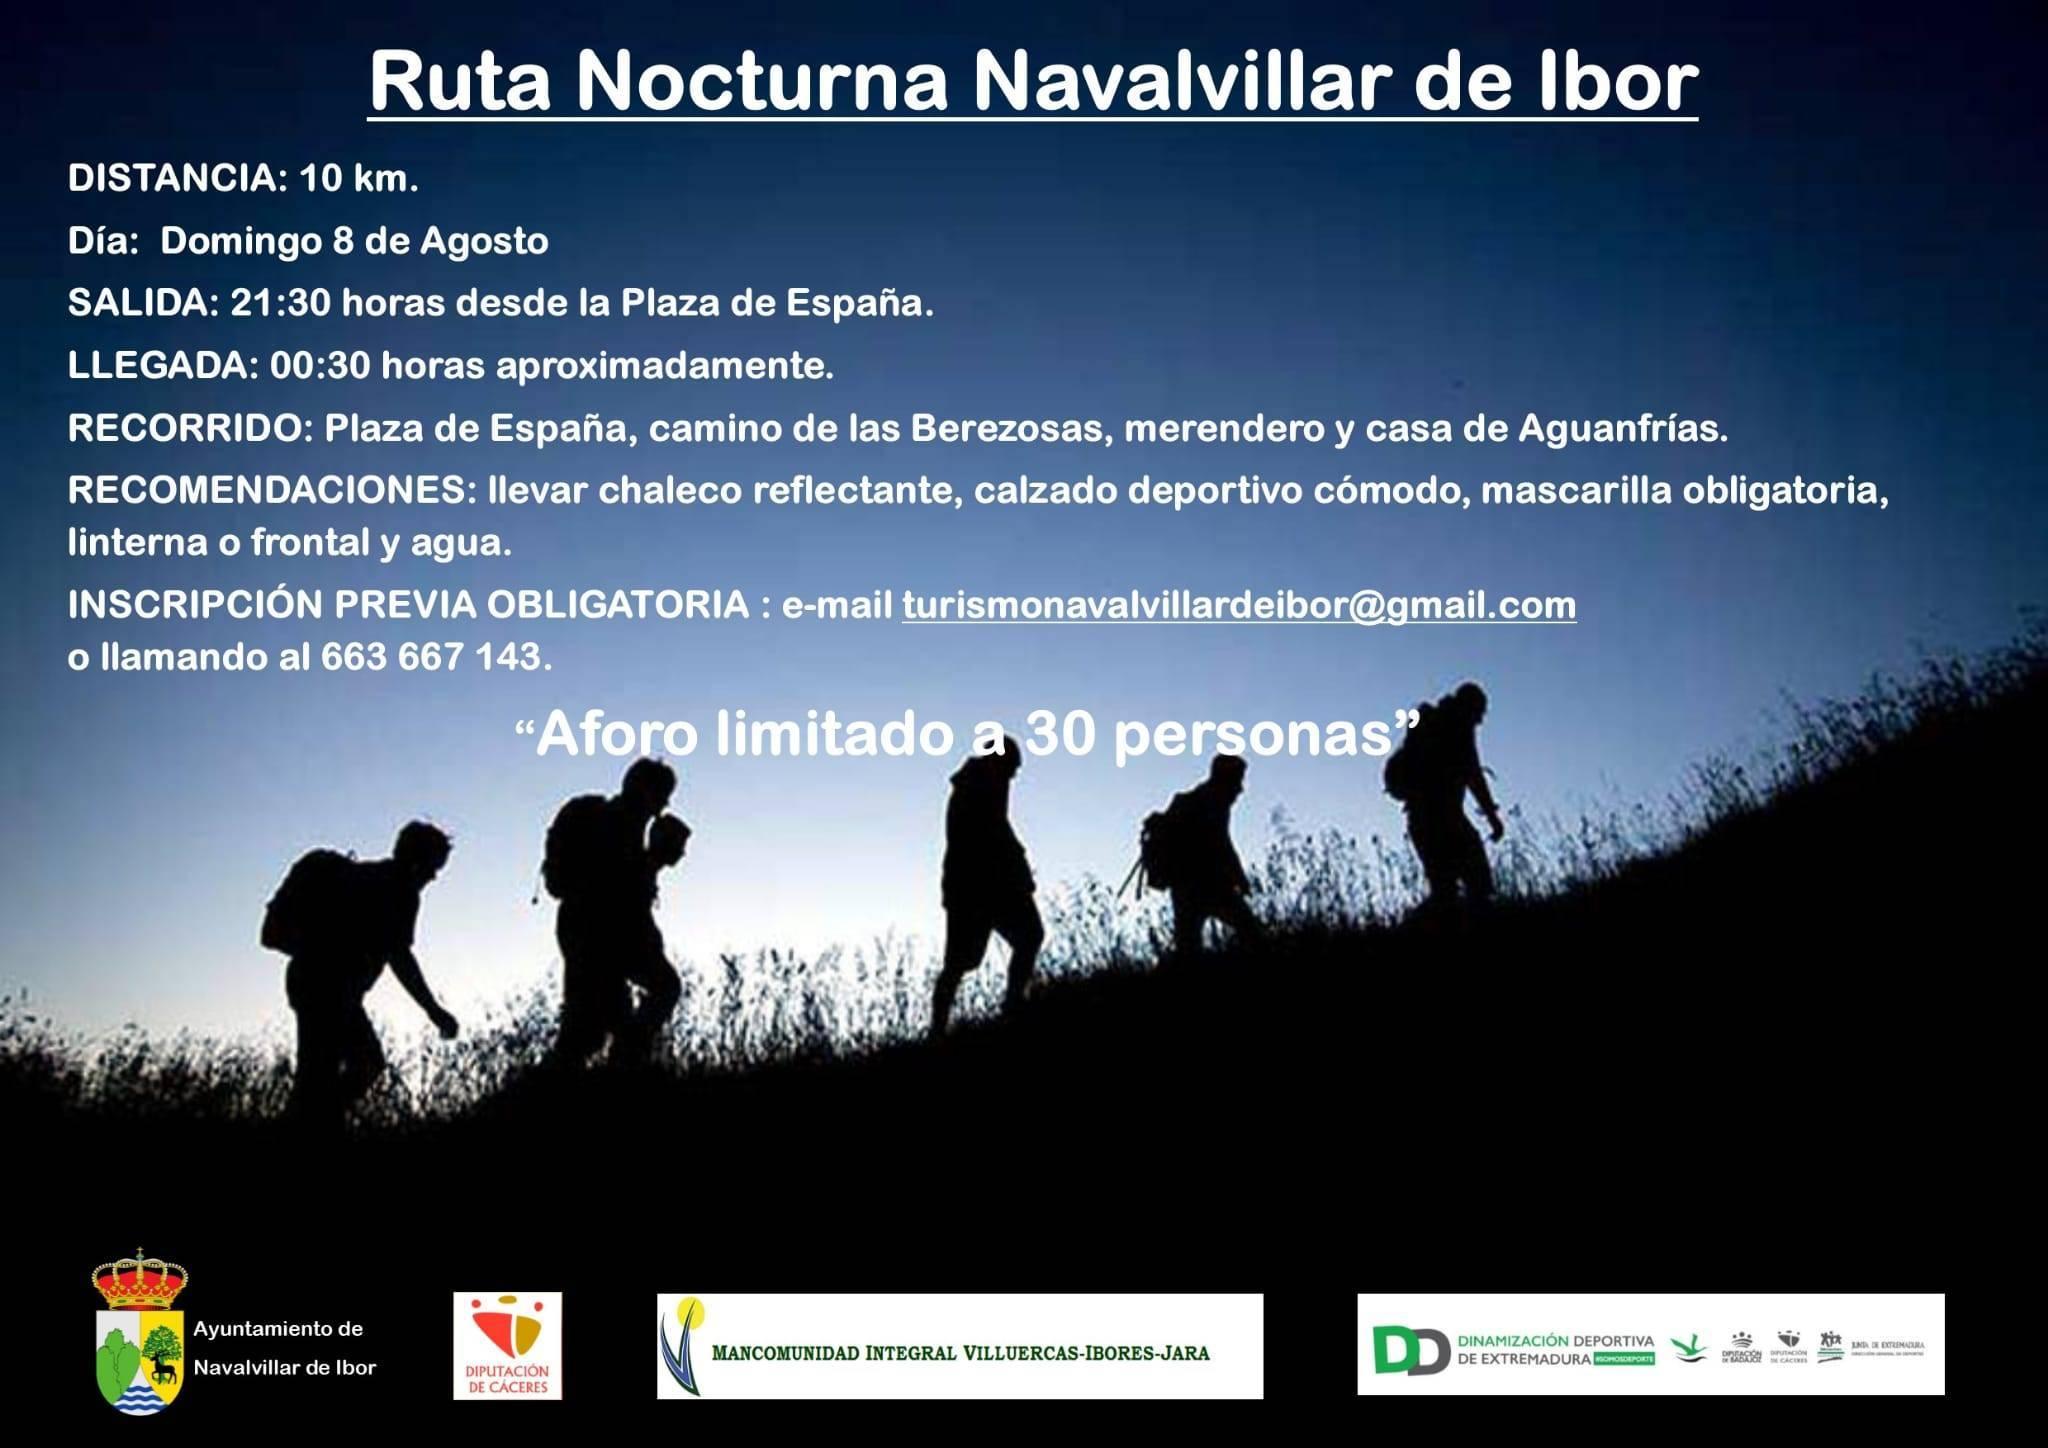 Ruta nocturna (2021) - Navalvillar de Ibor (Cáceres)